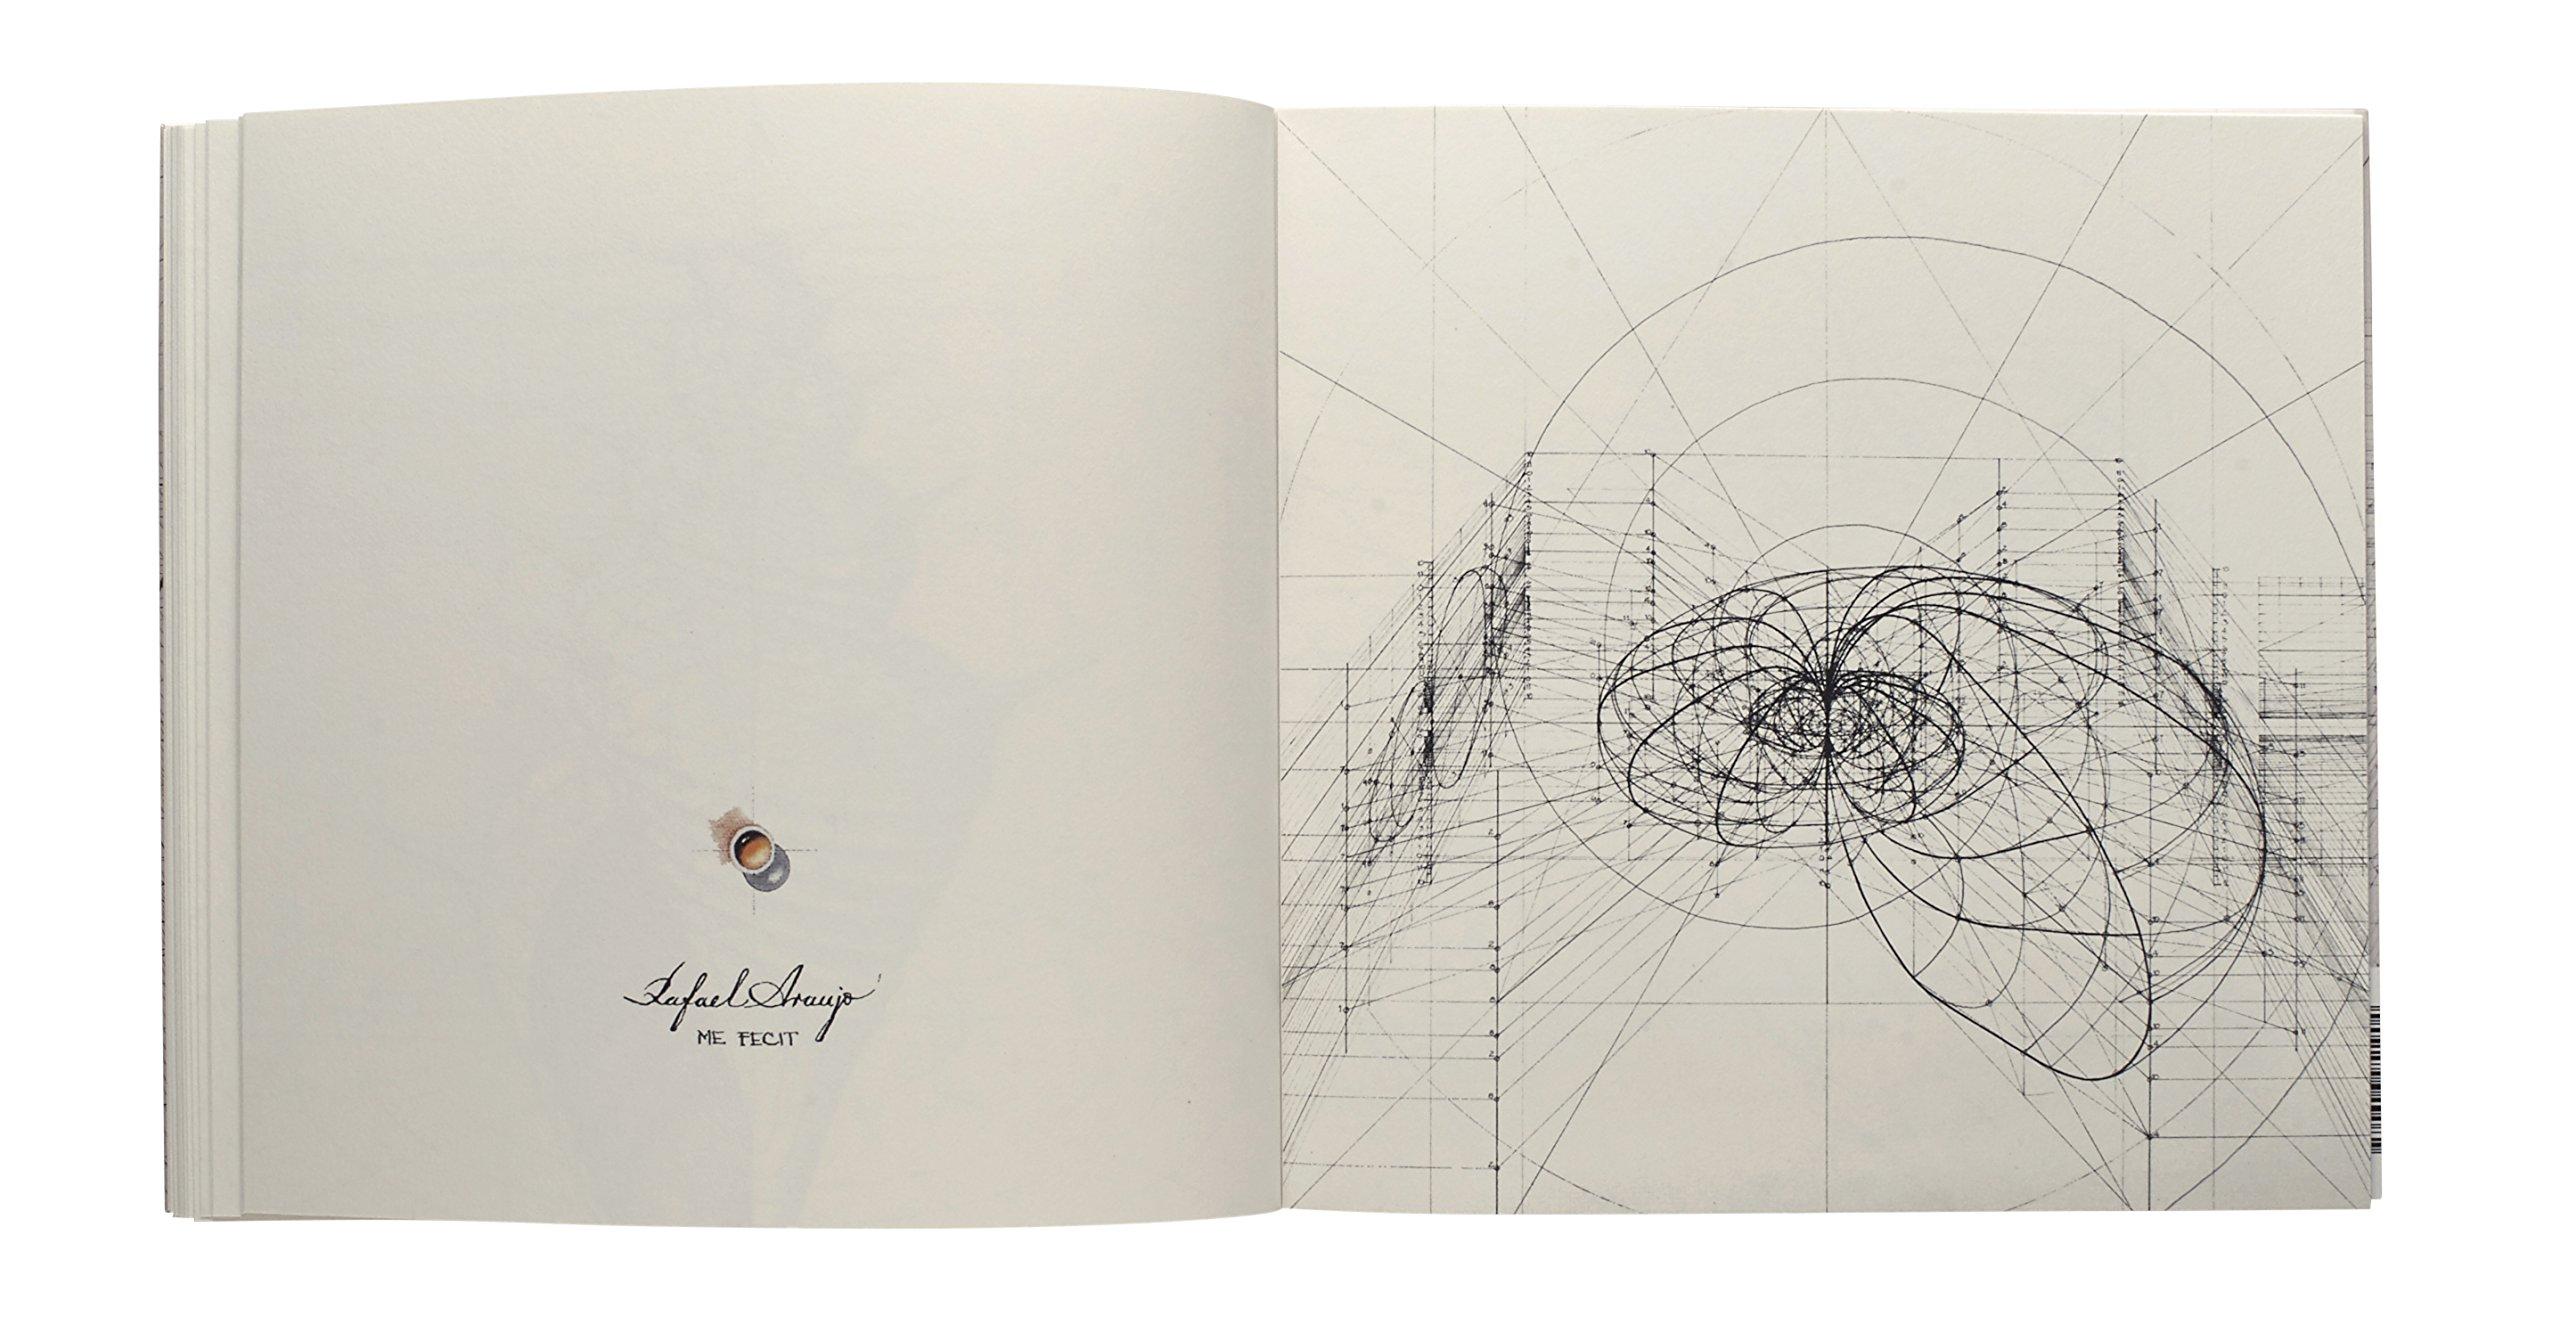 Emotional Lines In Art : Amazon.com: golden ratio coloring book by artist rafael araujo